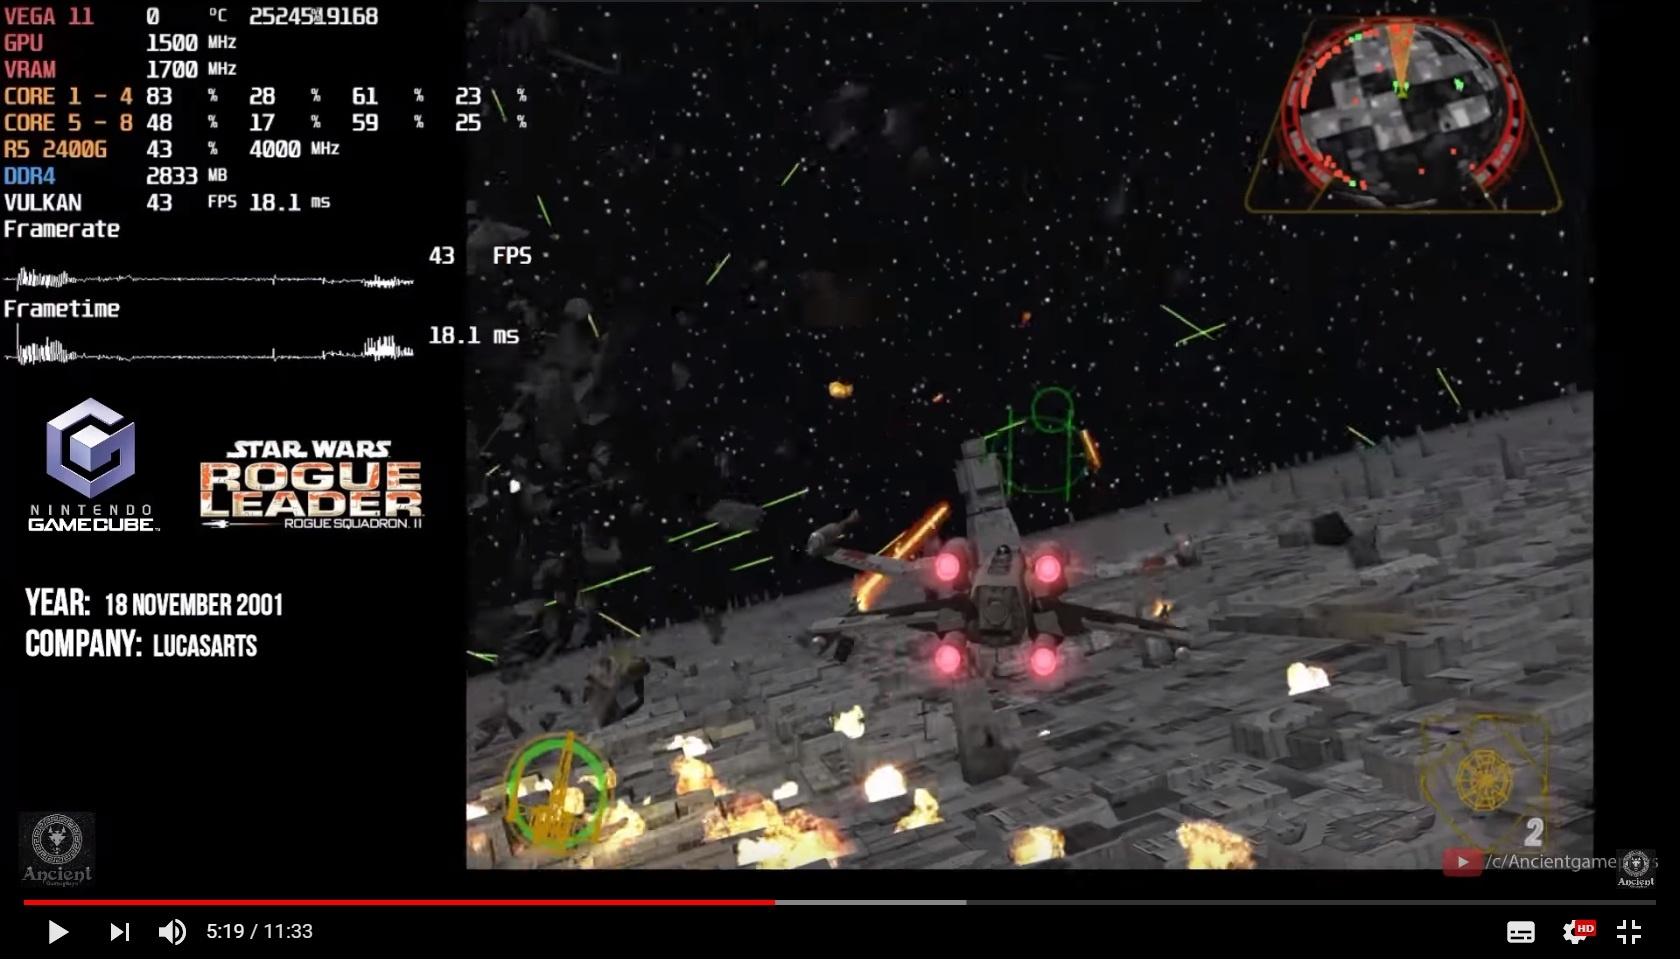 Dolphin Emulator | Ryzen 5 2400G APU | Gamecube and Nintendo